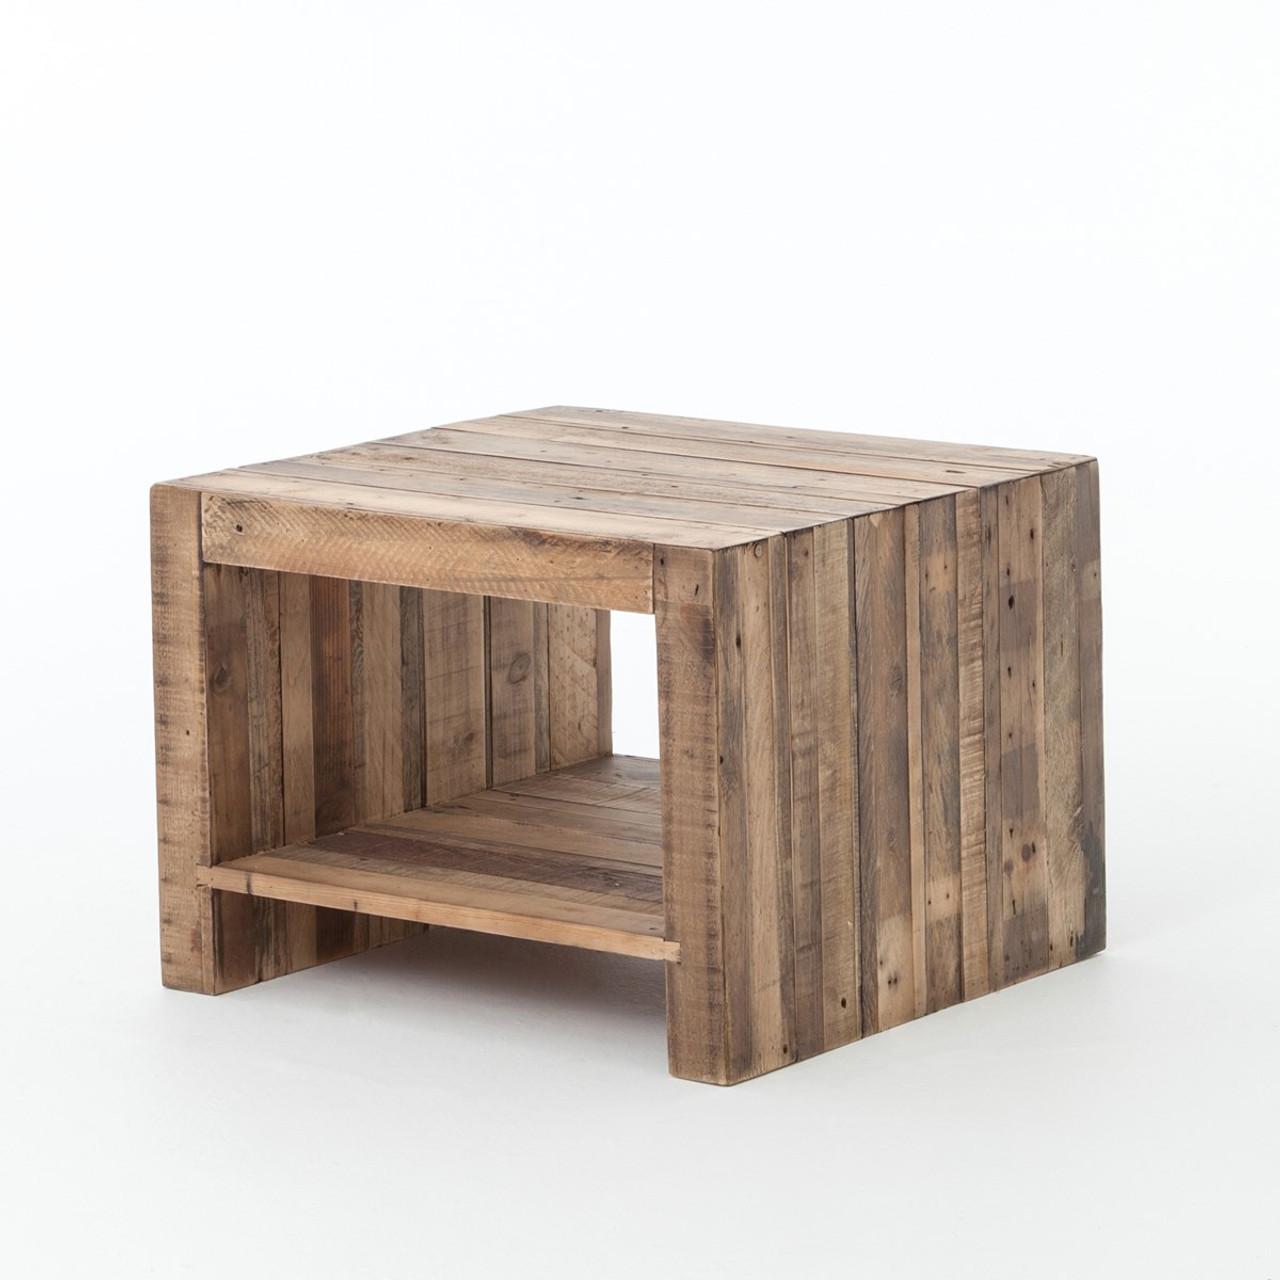 official photos e7e74 7f380 Angora Reclaimed Wood Square End Table